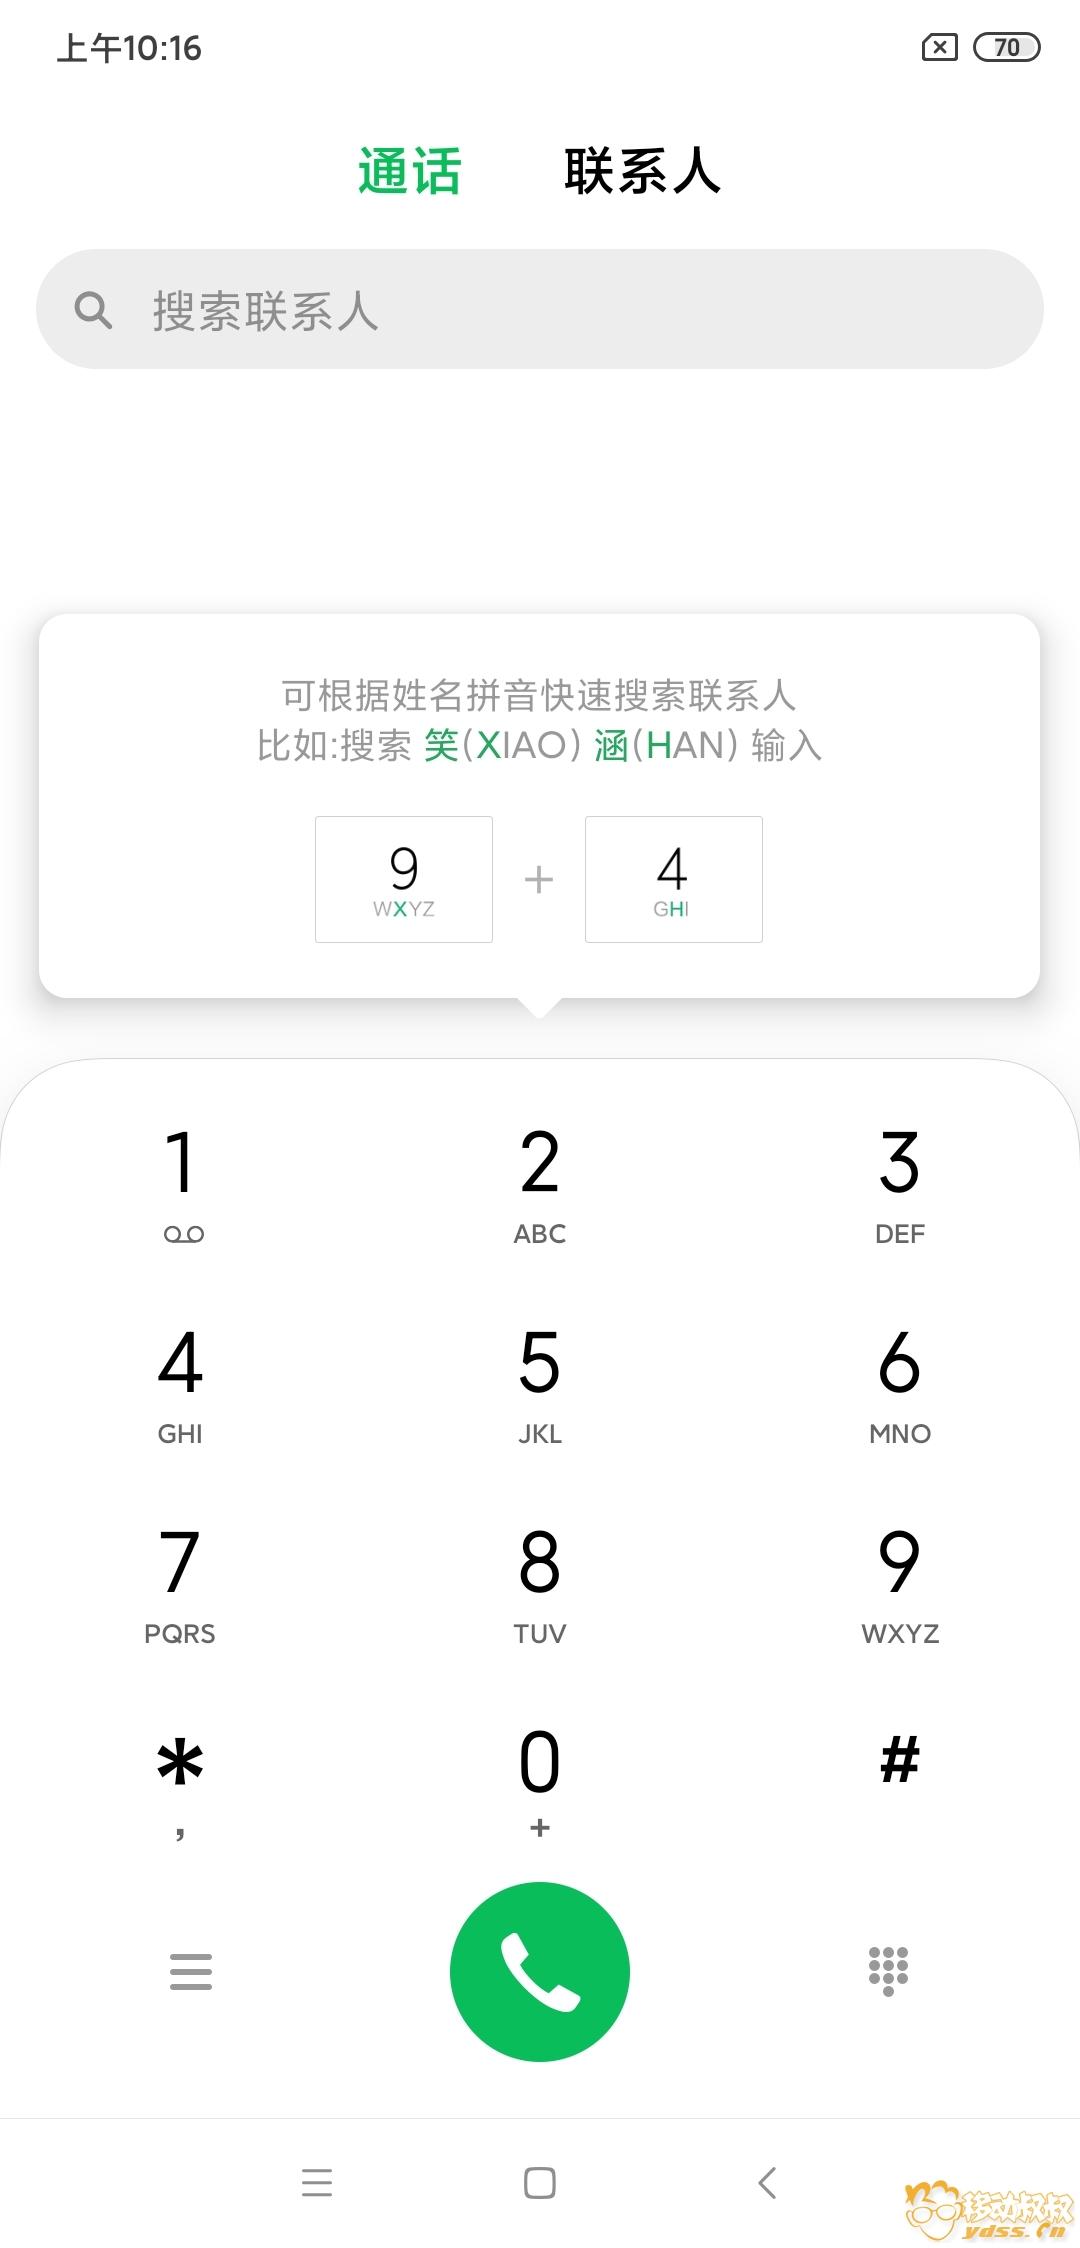 Screenshot_2019-10-12-10-16-39-602_com.android.contacts.jpg